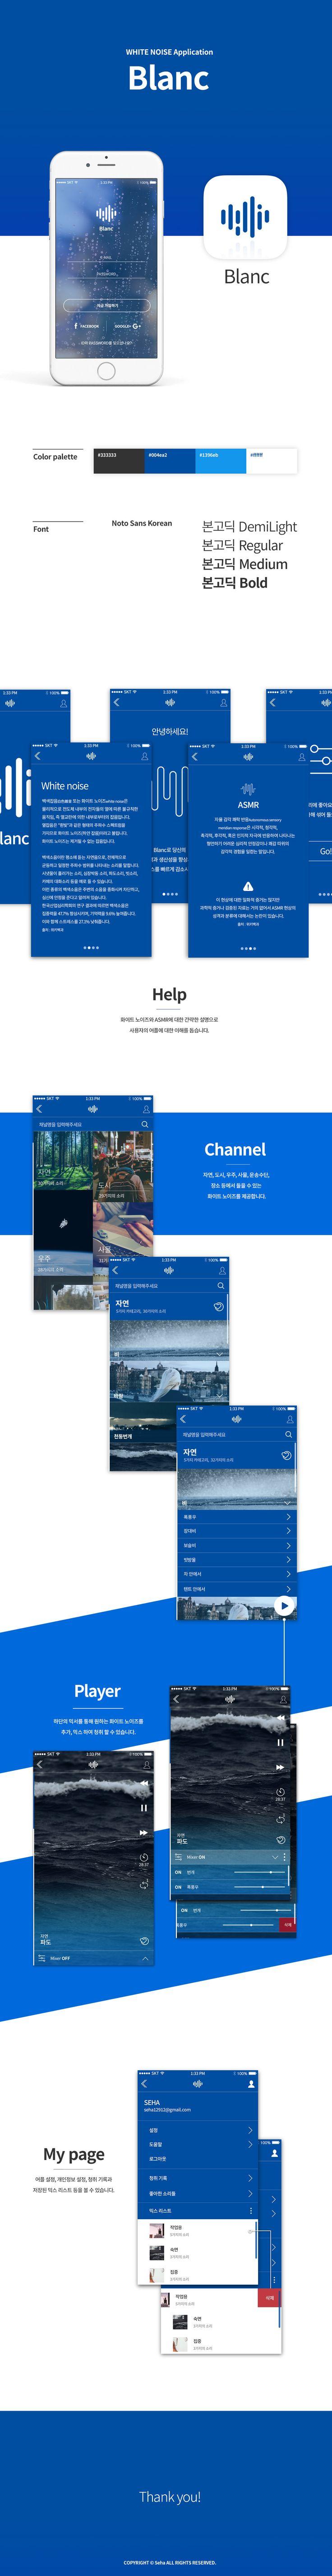 White noise & ASMR Application : Blanc - 그래픽 디자인 · 브랜딩/편집, 그래픽 디자인, 브랜딩/편집, 그래픽 디자인, UI/UX